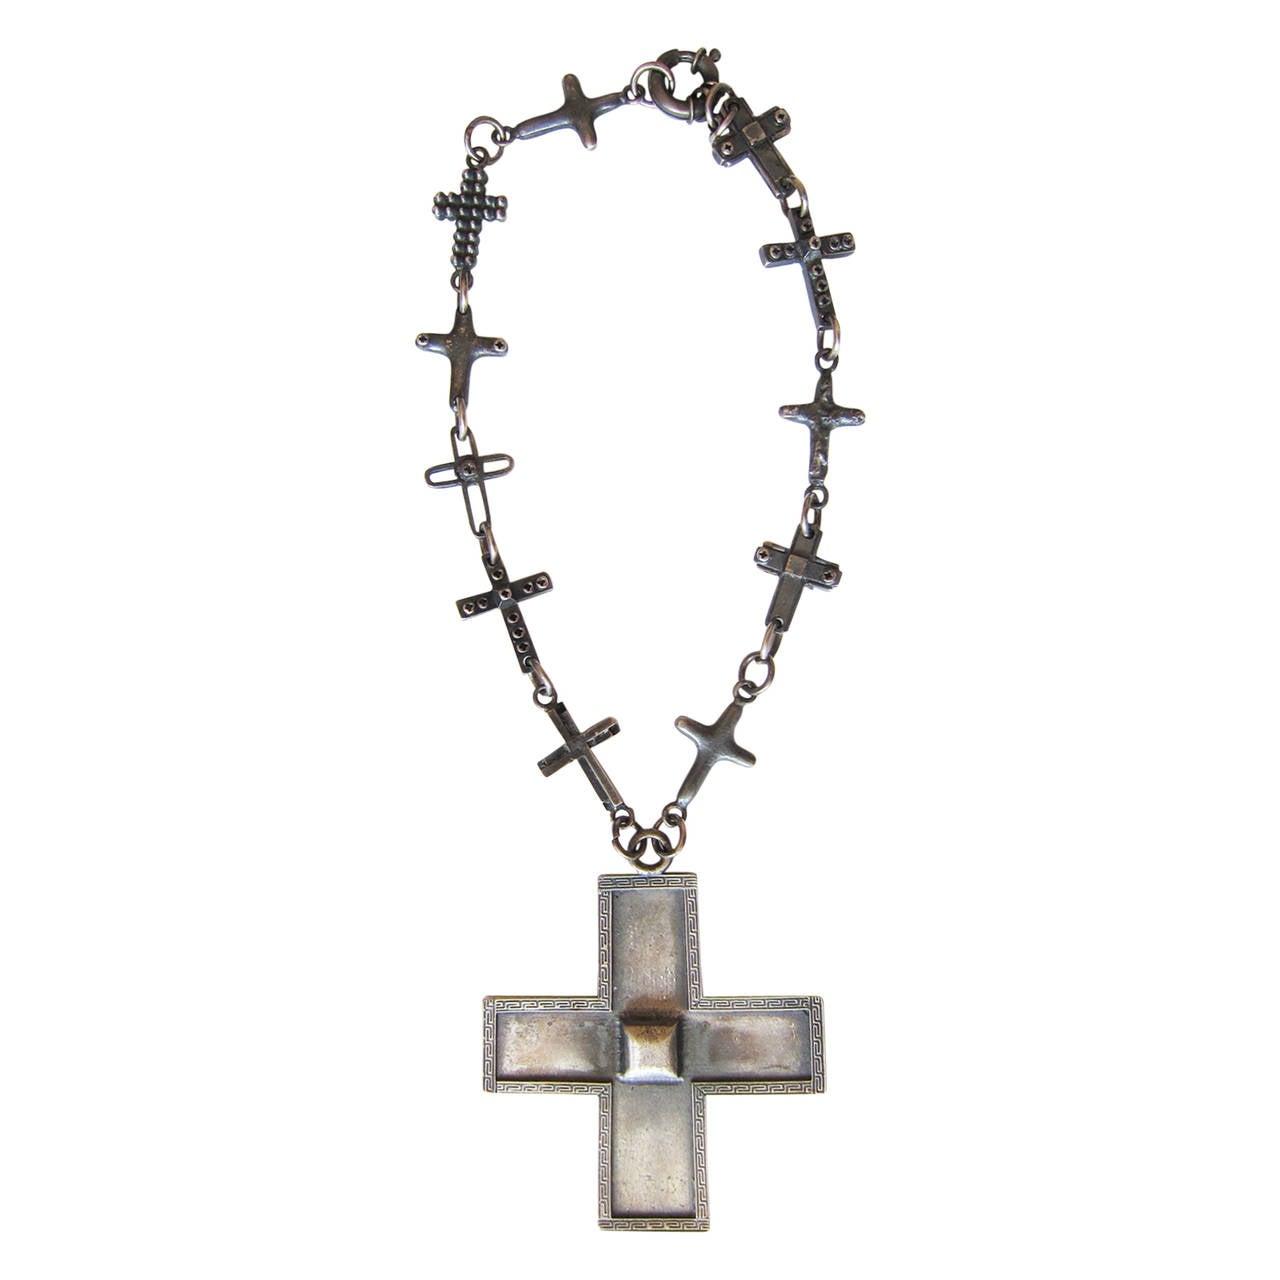 Gianni Versace Massive Cross Necklace 1990's 1